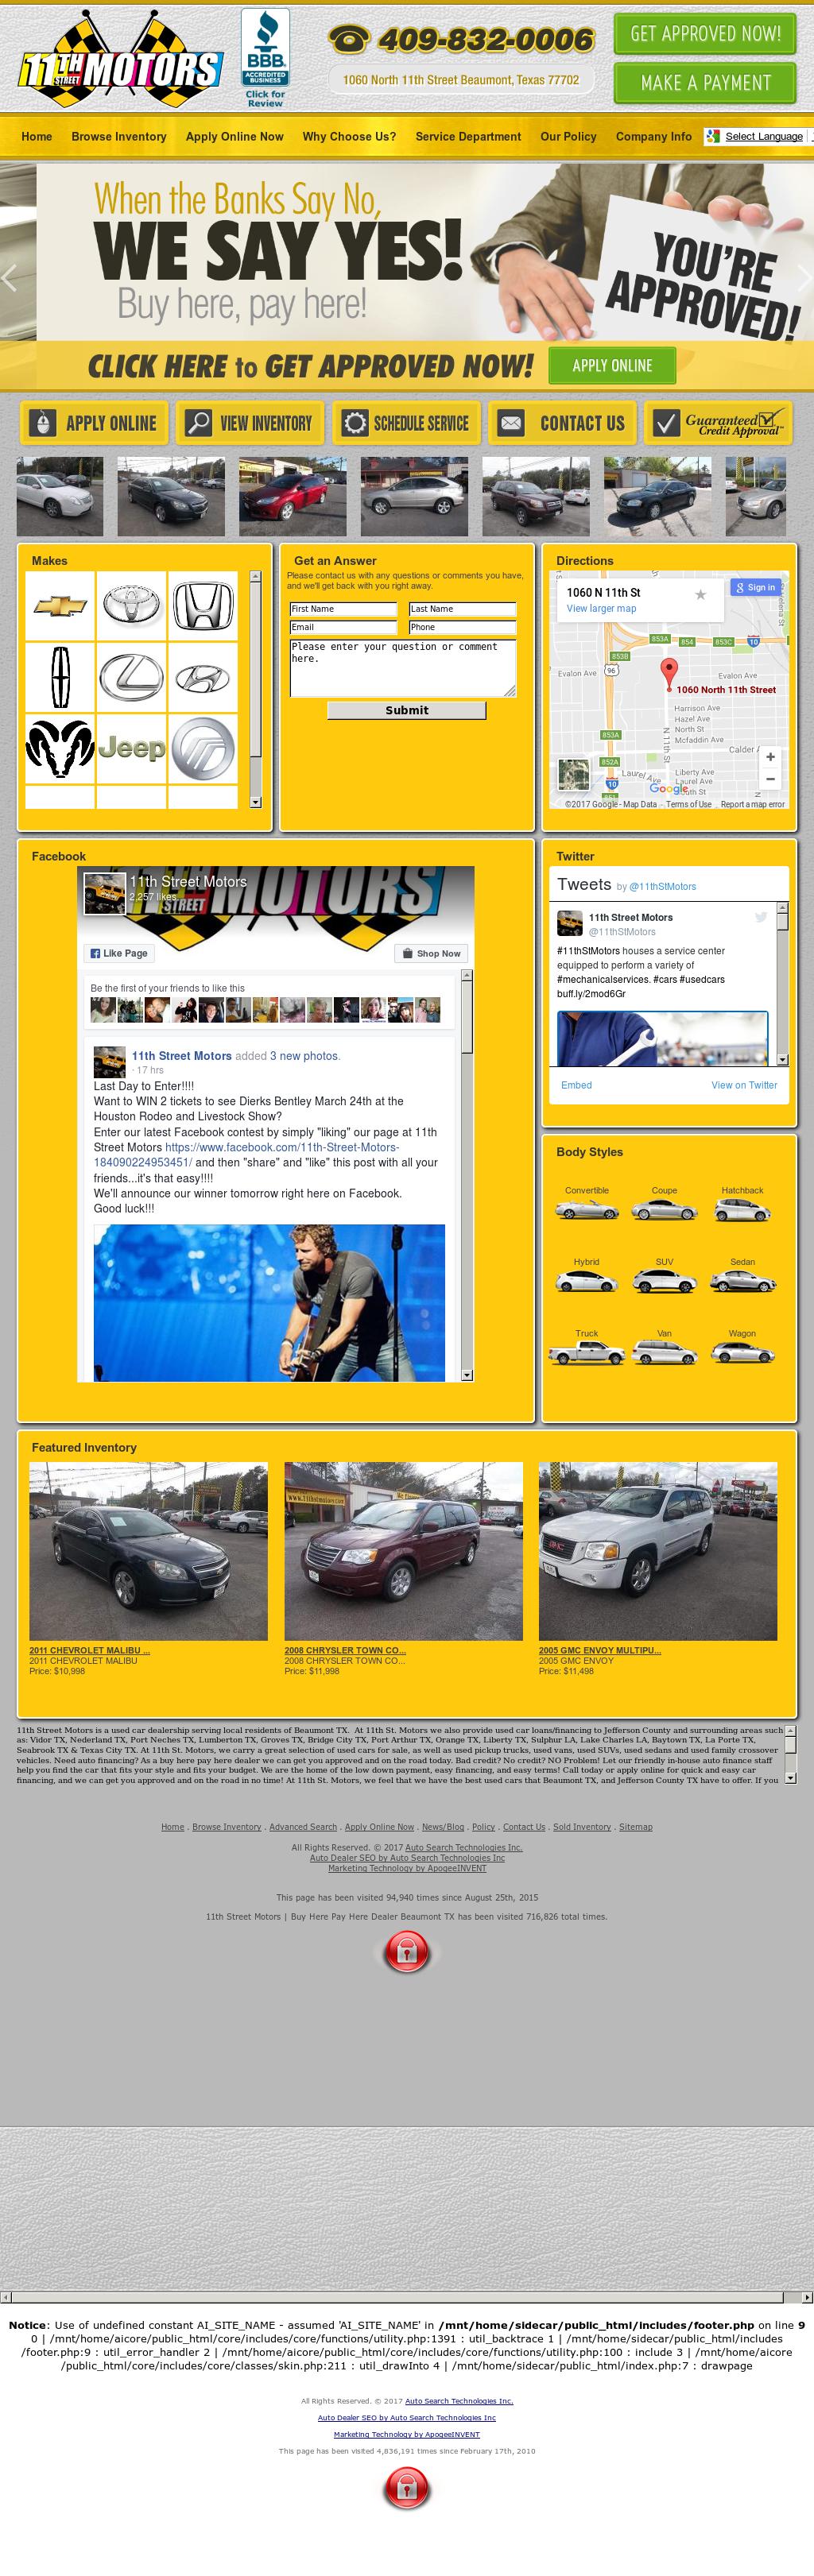 11th Street Motors website history